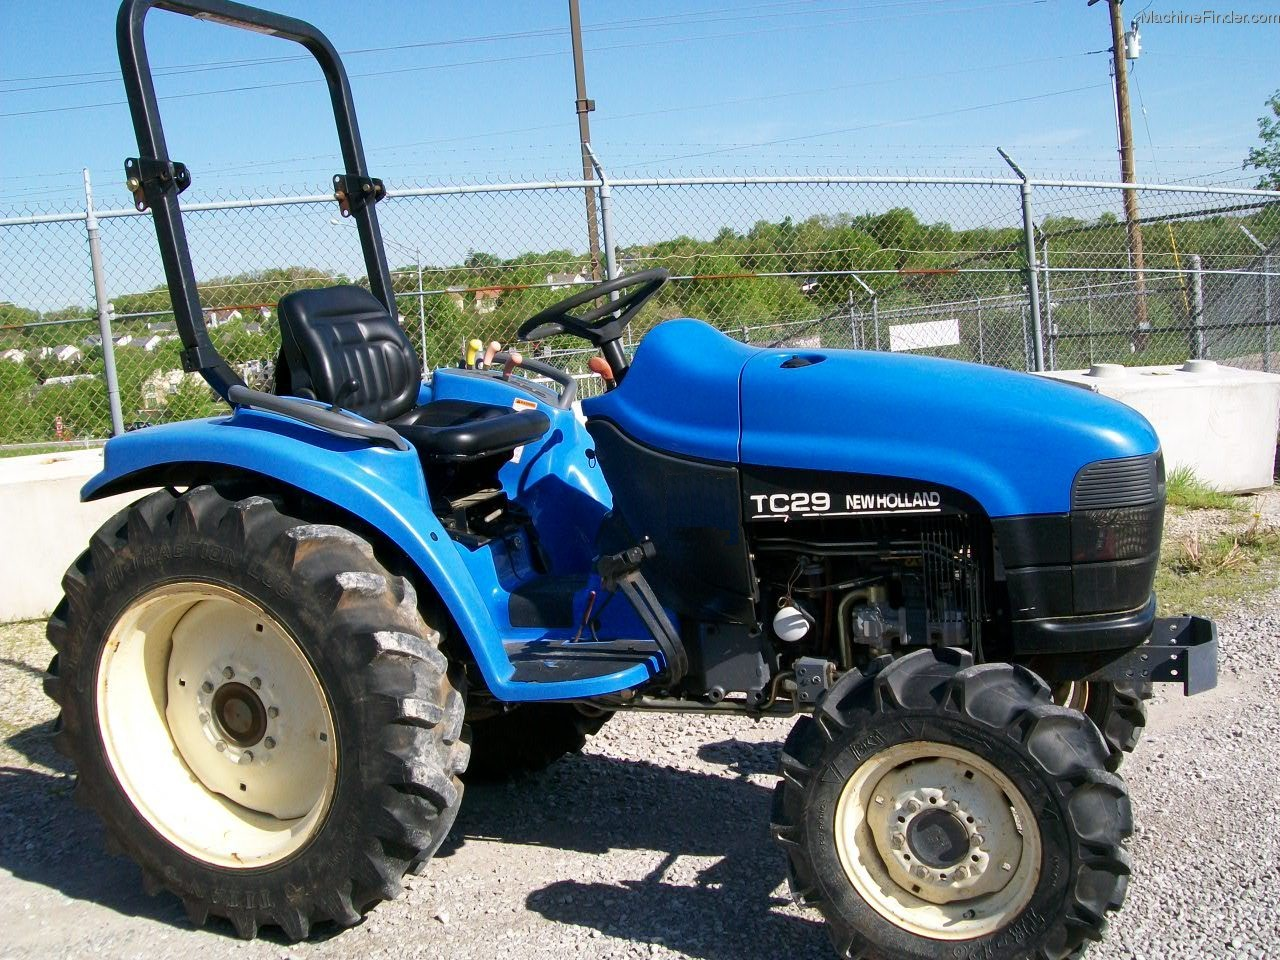 New Holland Farm Tractors | Farm Tractors: Farm Tractors - tractorhd on